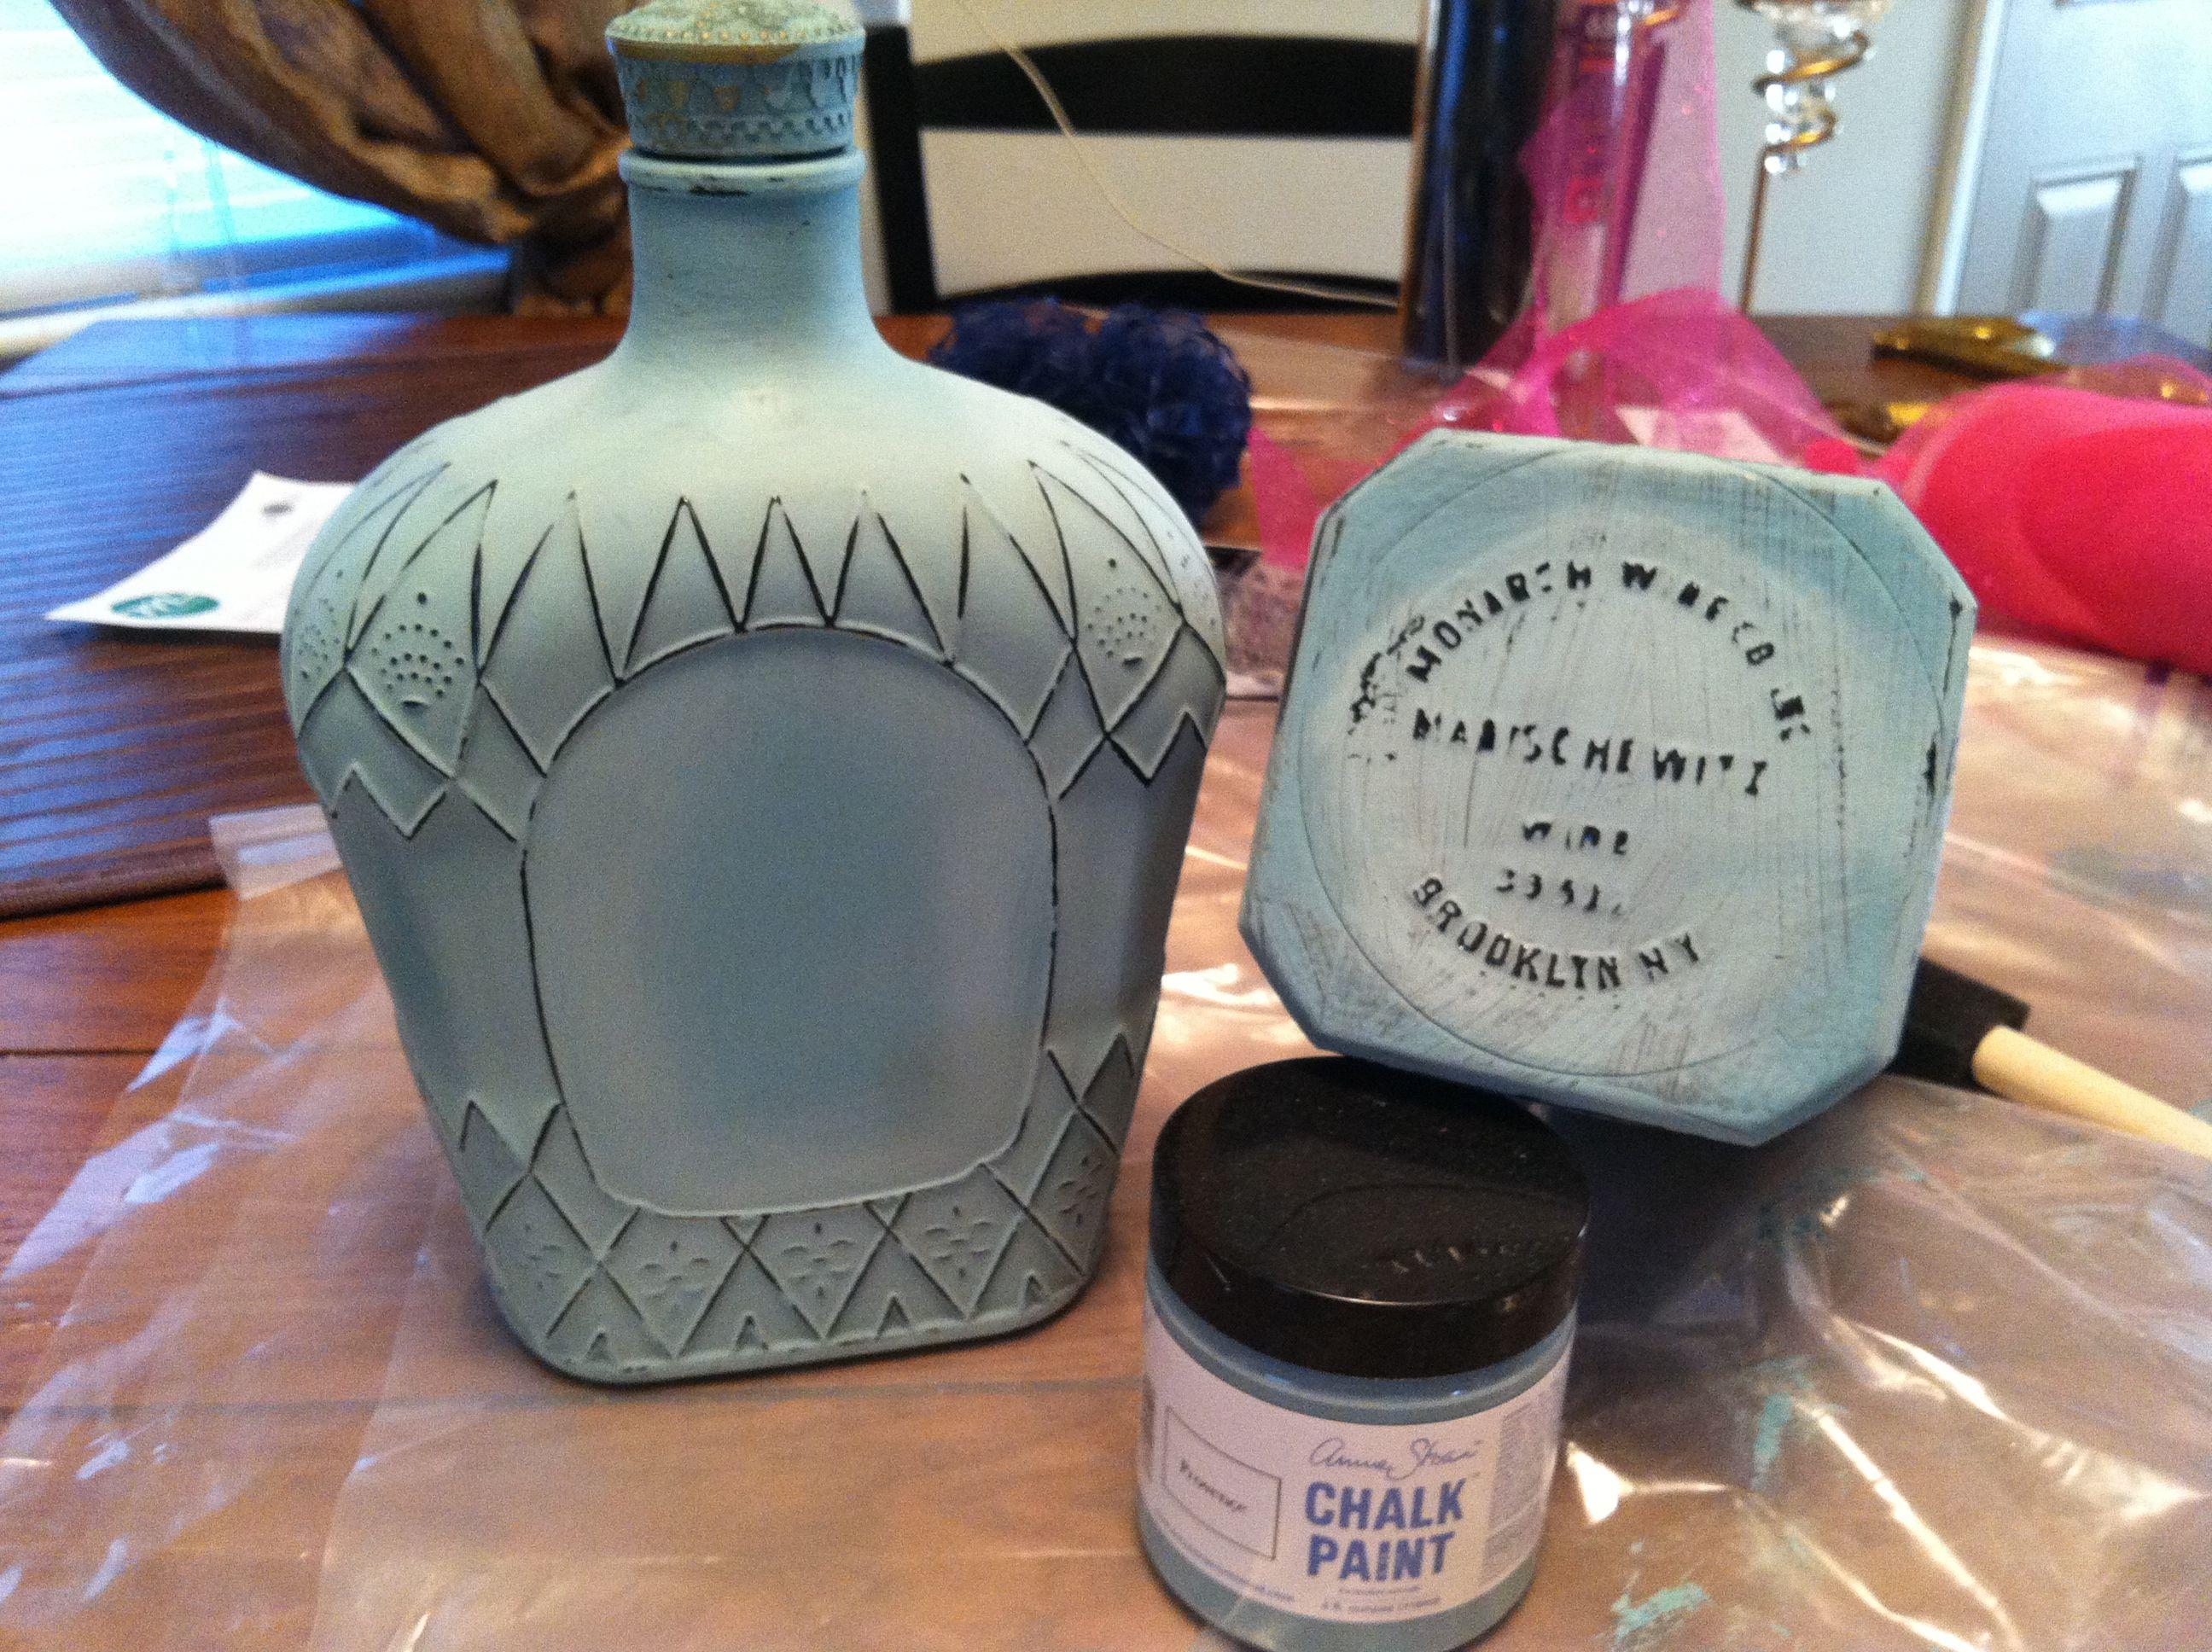 Chalk paint liquor bottles to make them